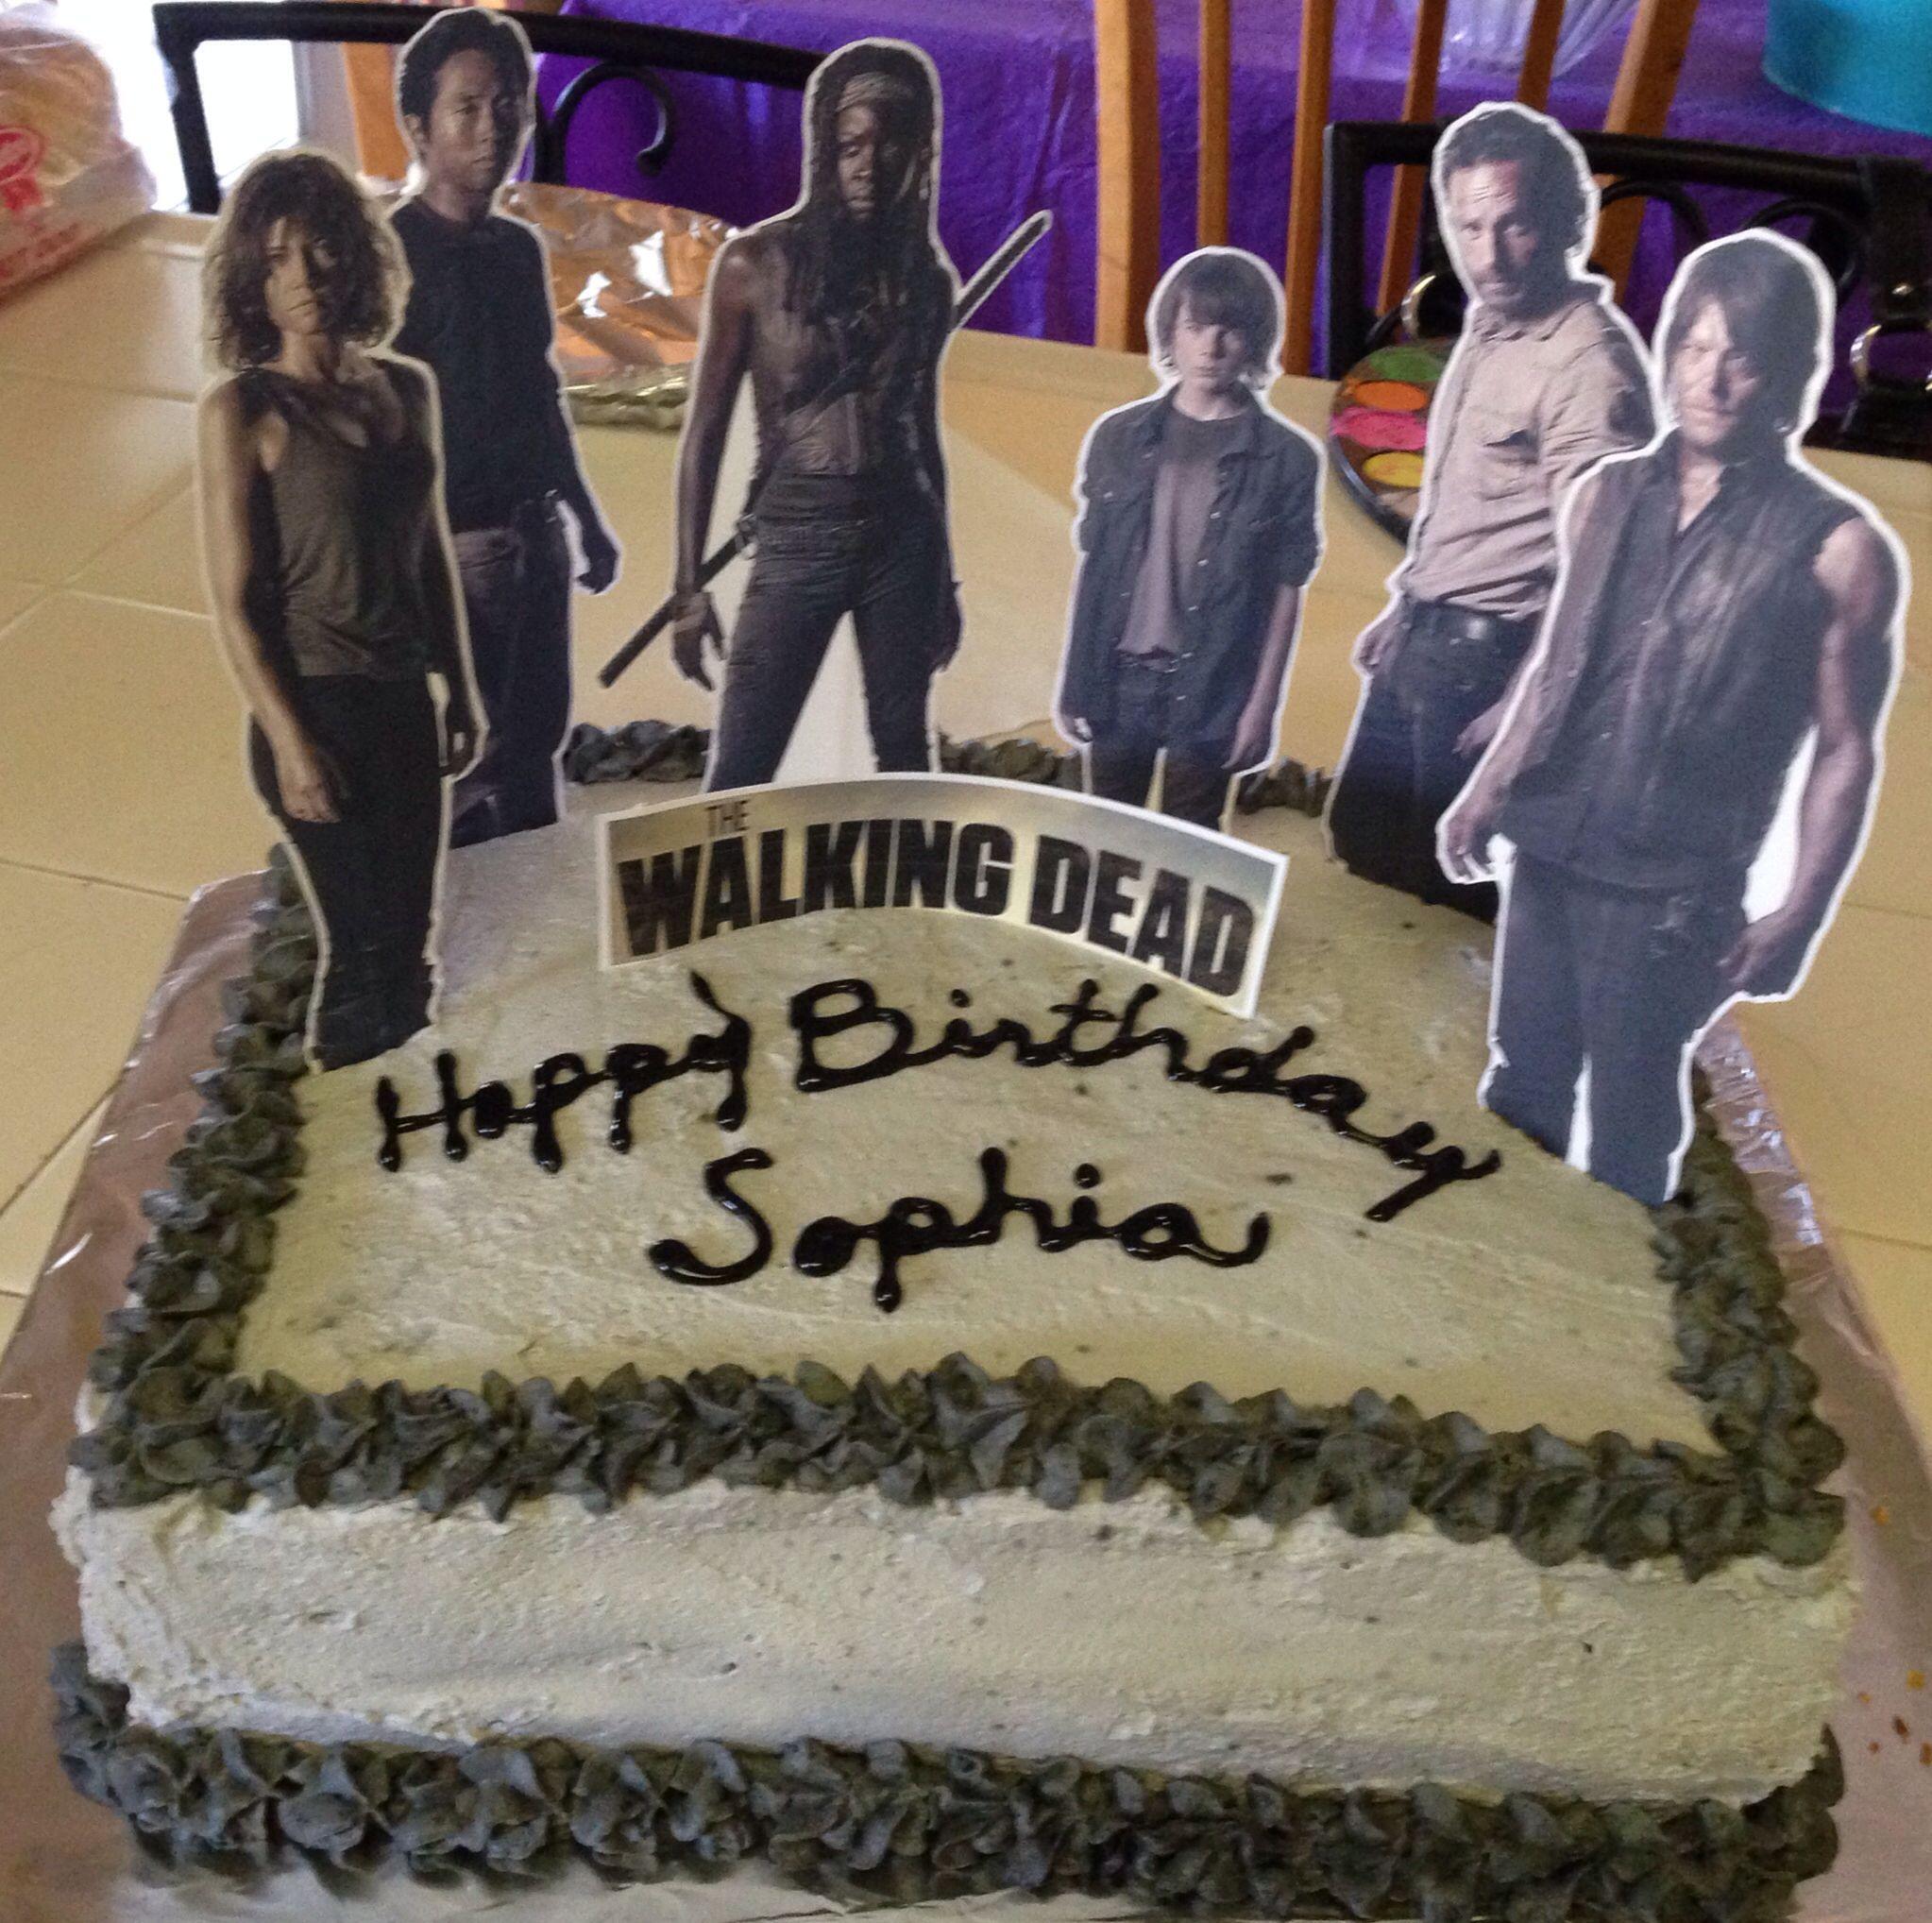 The Walking Dead Cake I Want Even Funnier It Says Sophia Xd